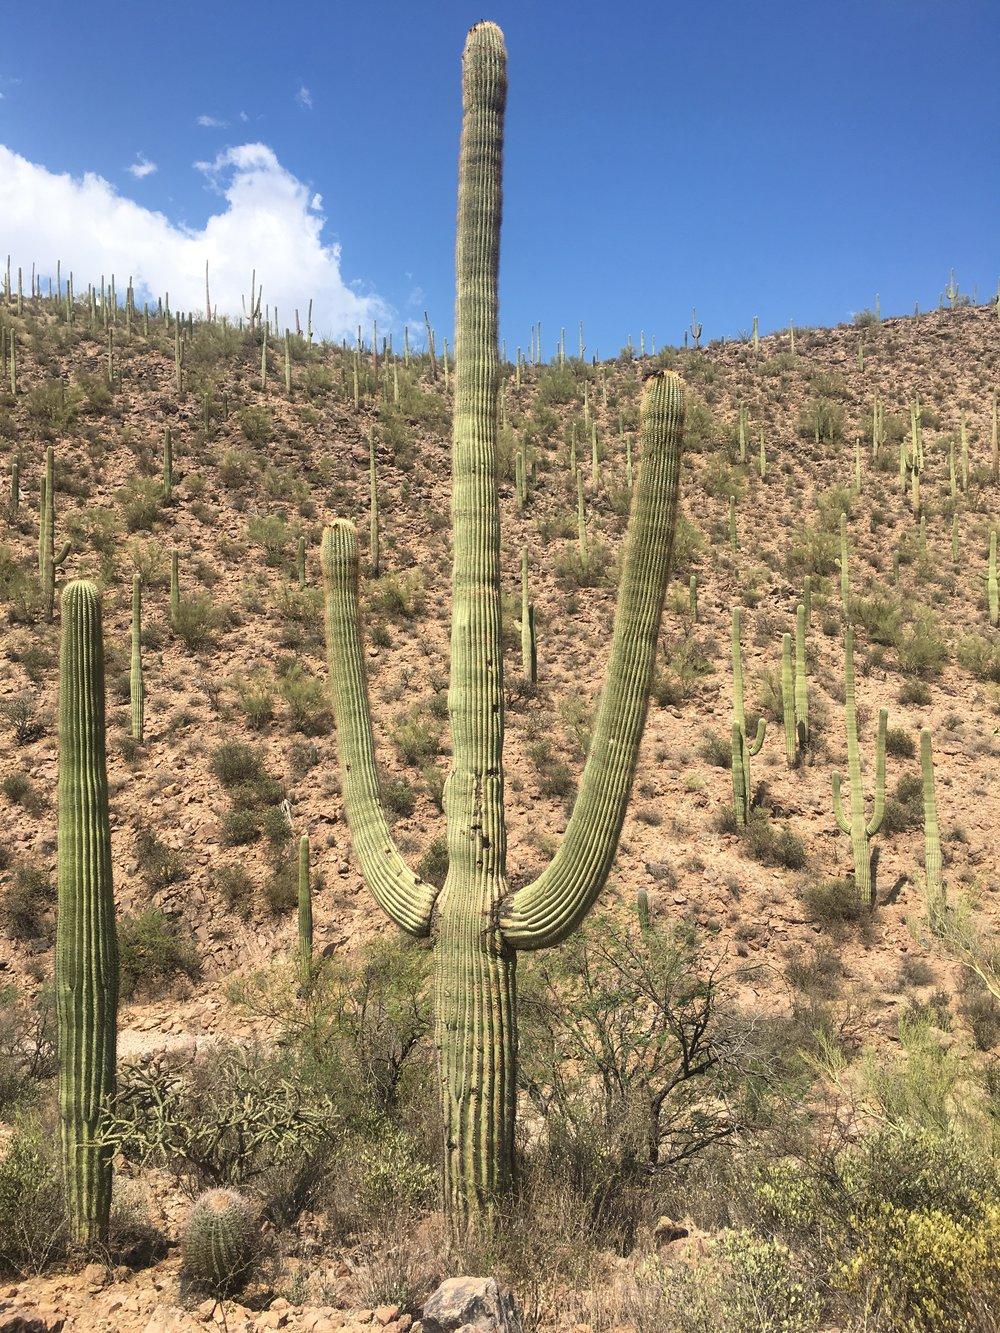 A fully-grown, centuries old Saguaro.